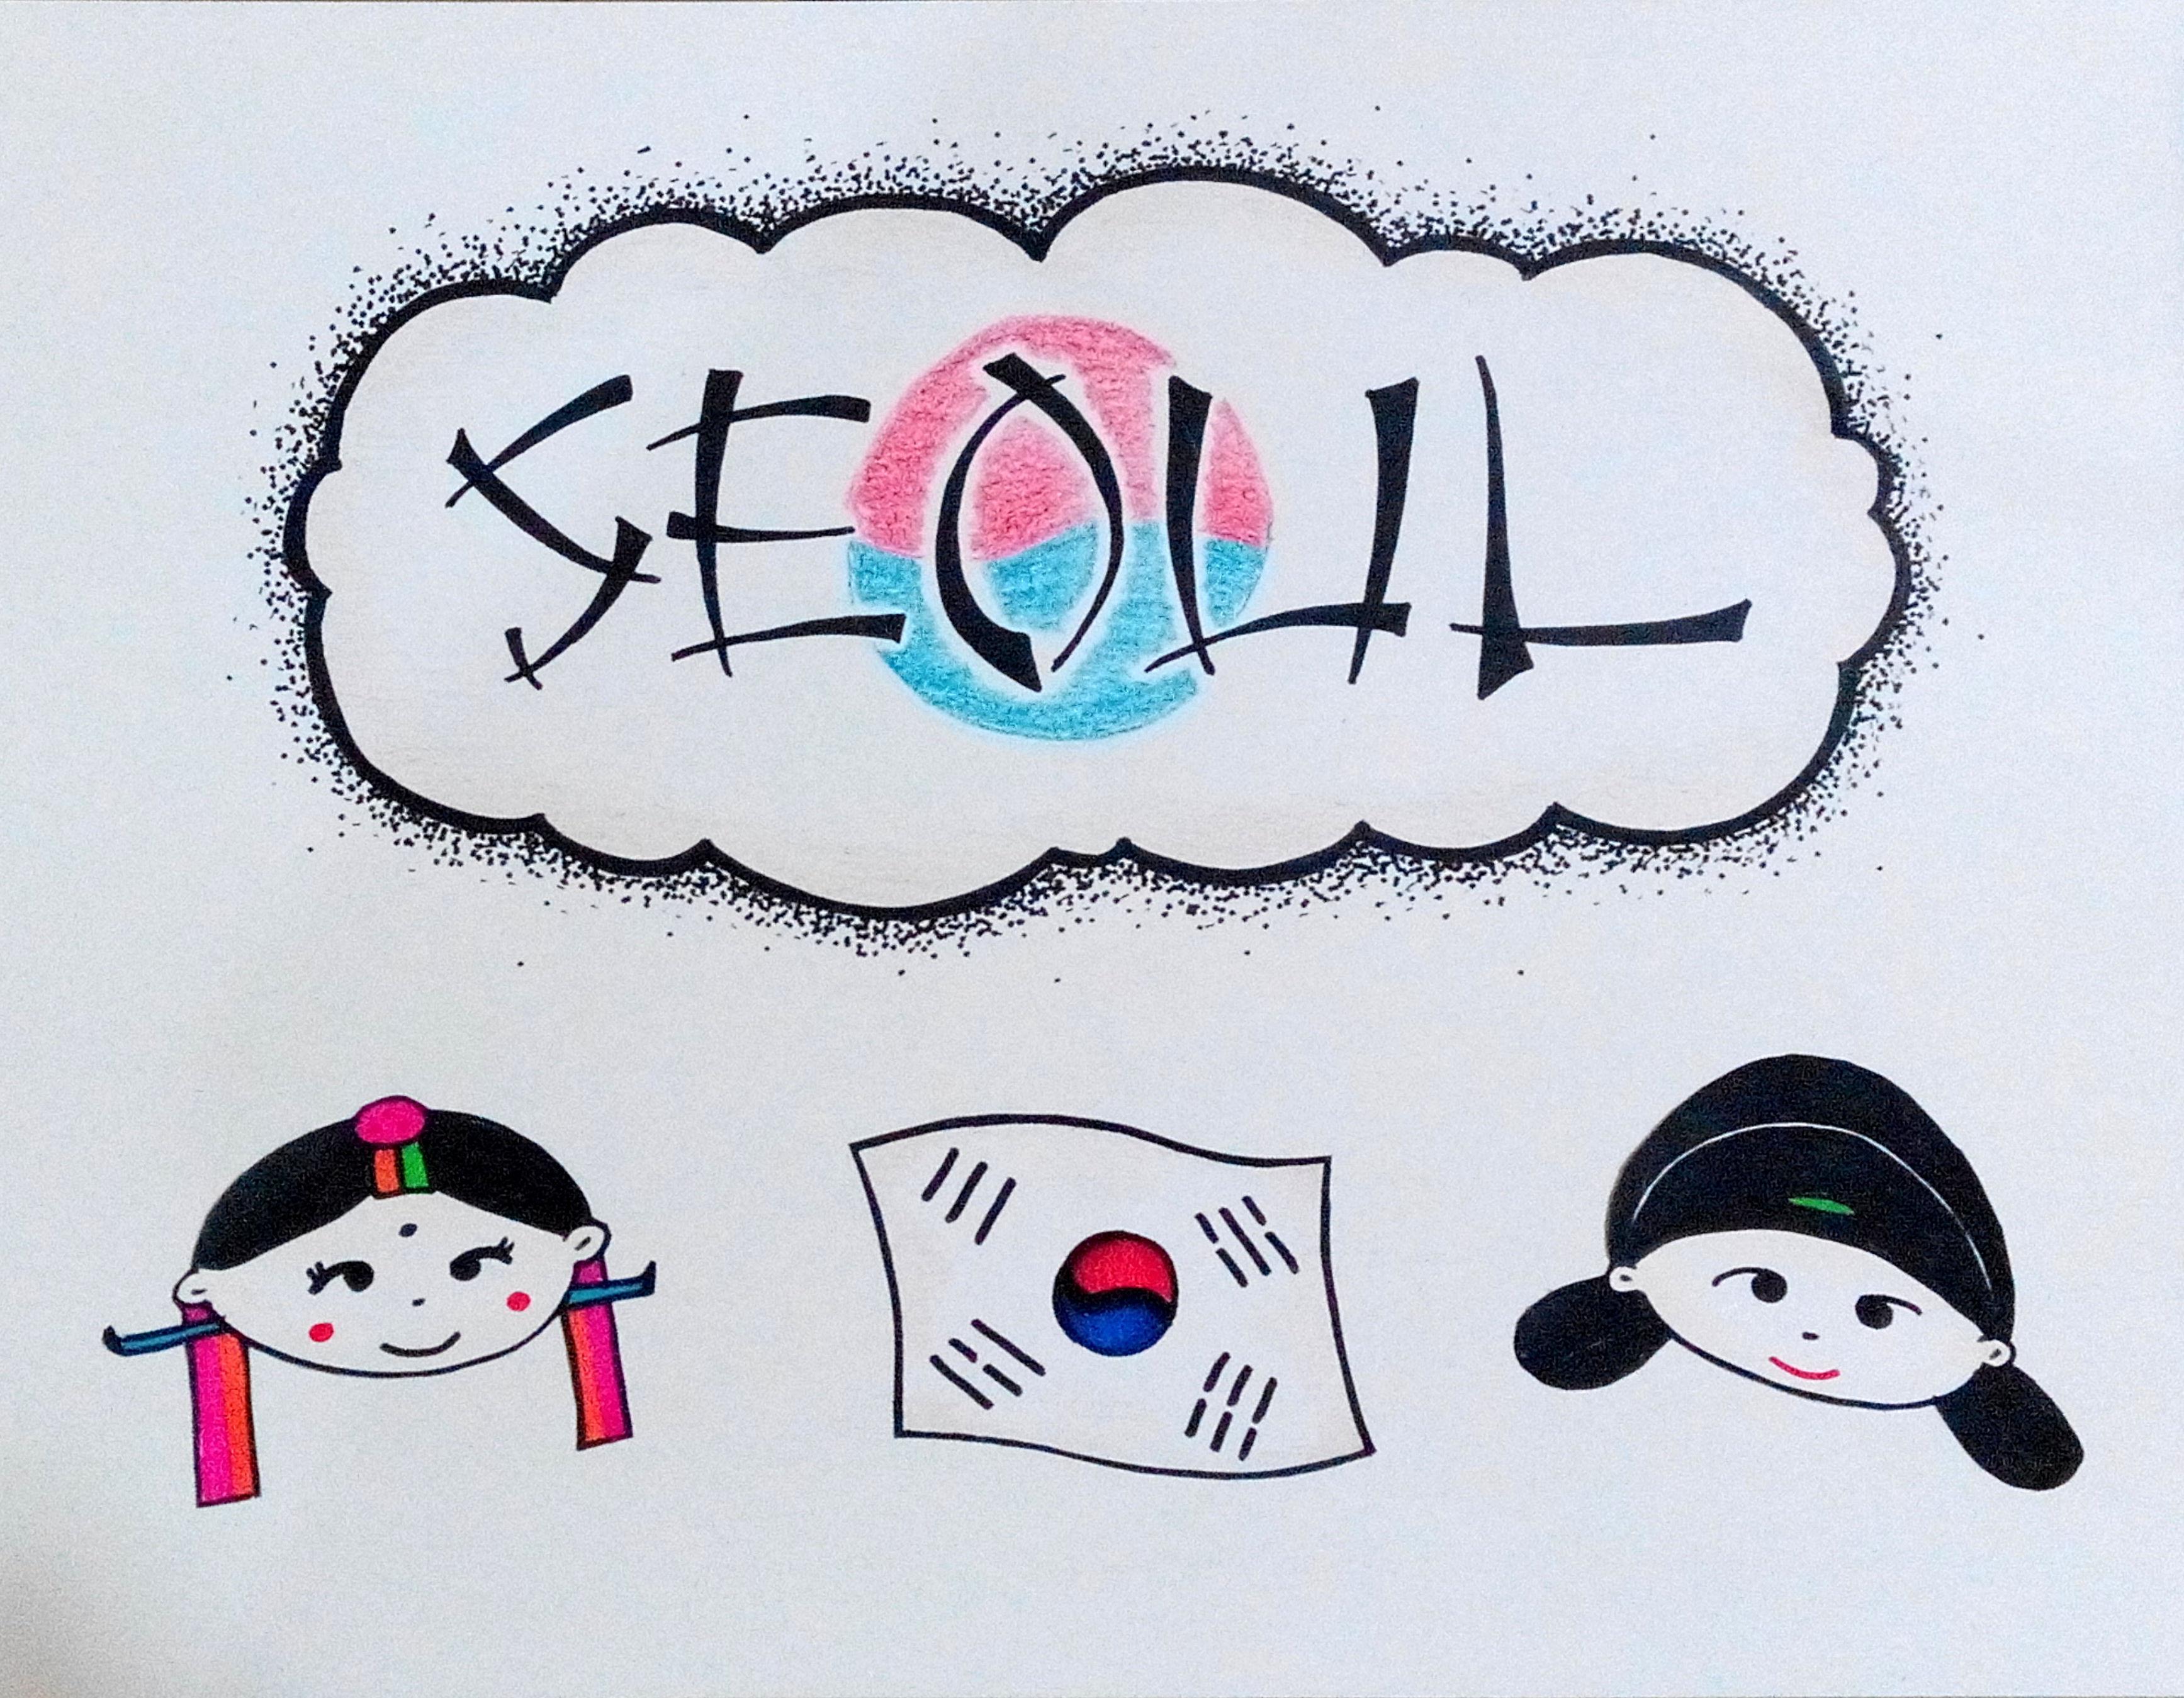 TypographySeoul-original